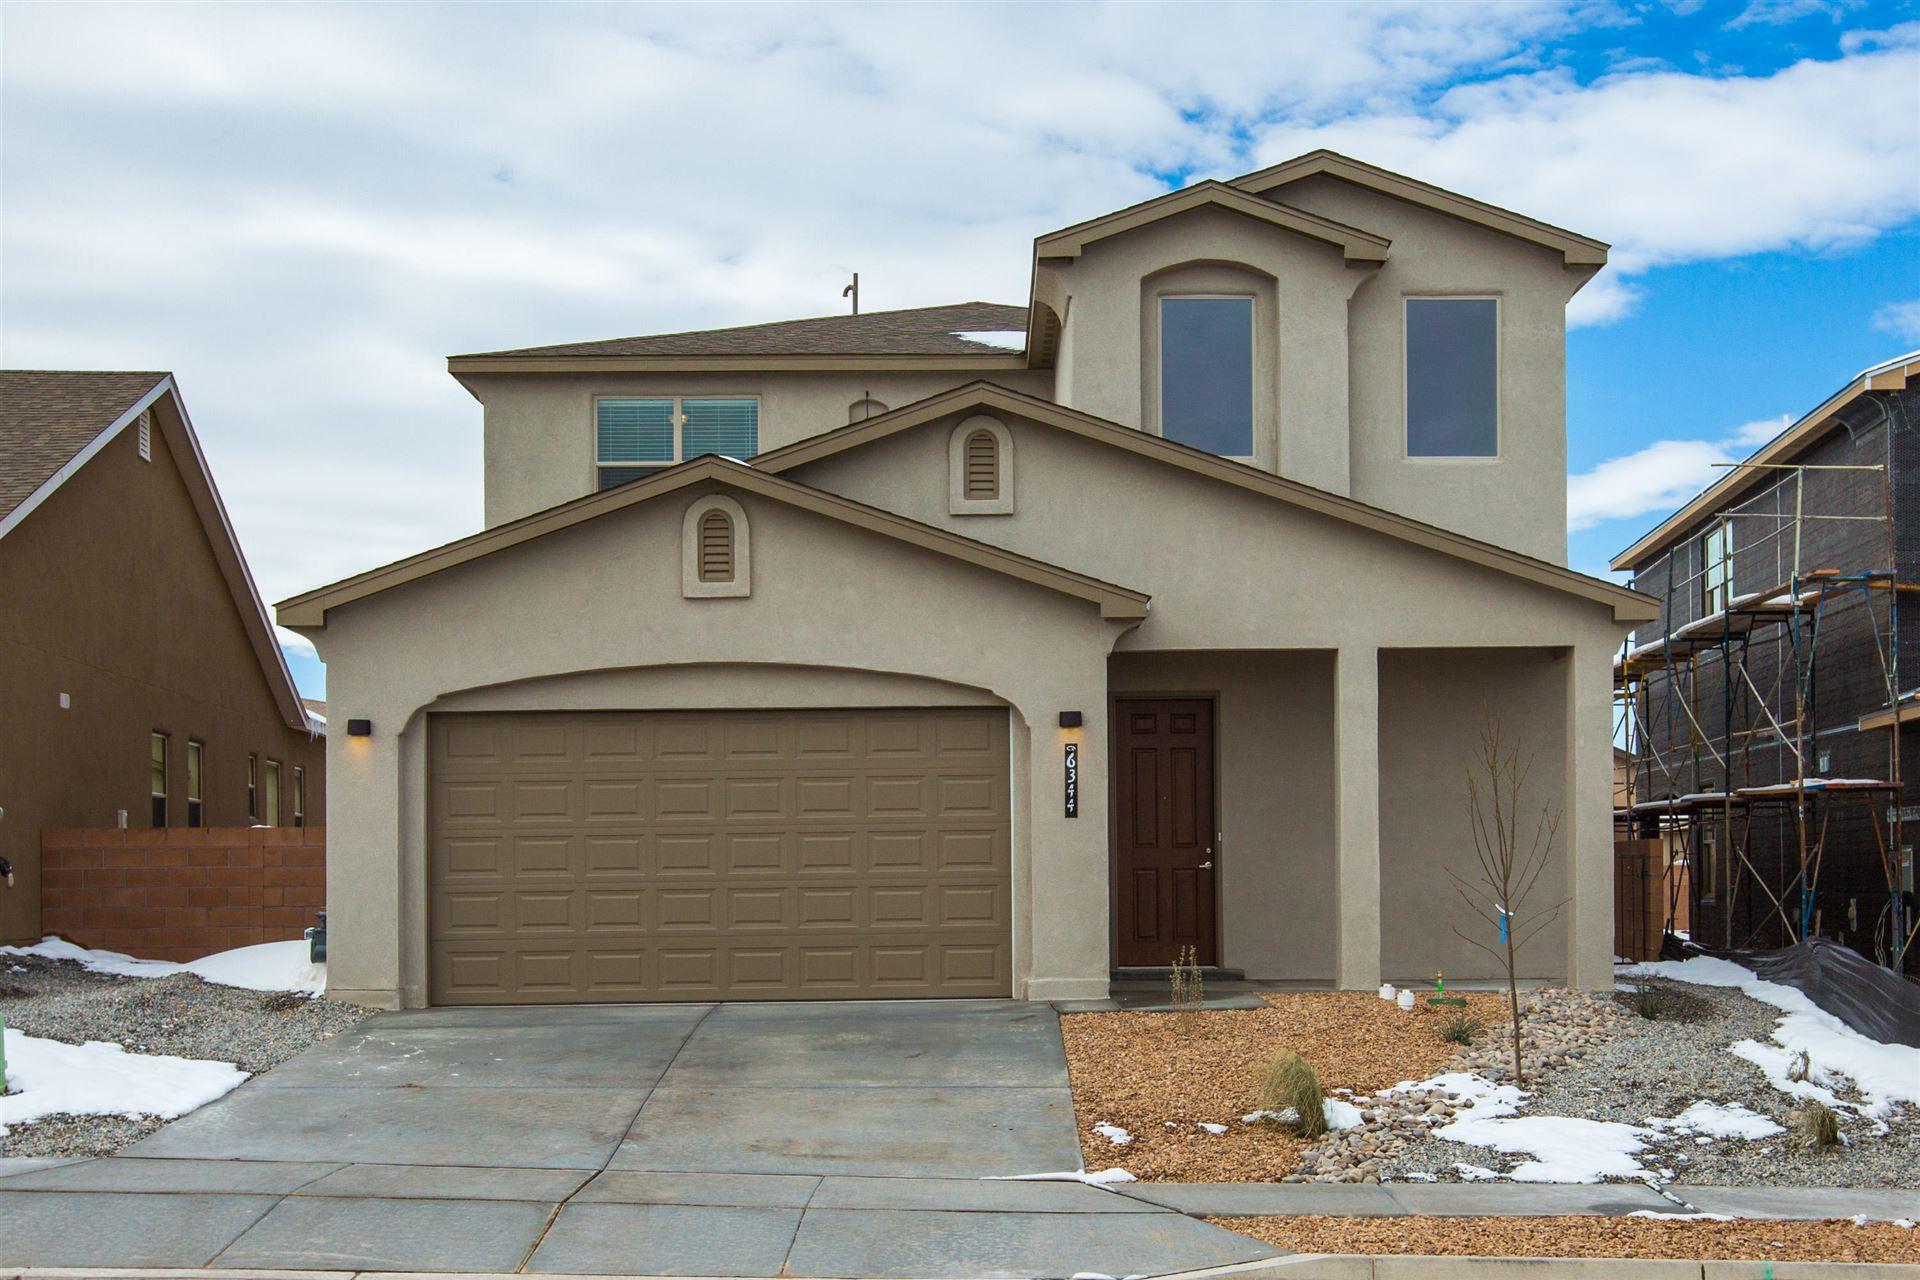 11413 MANZANO VISTA Avenue SE, Albuquerque, NM 87123 - MLS#: 983605